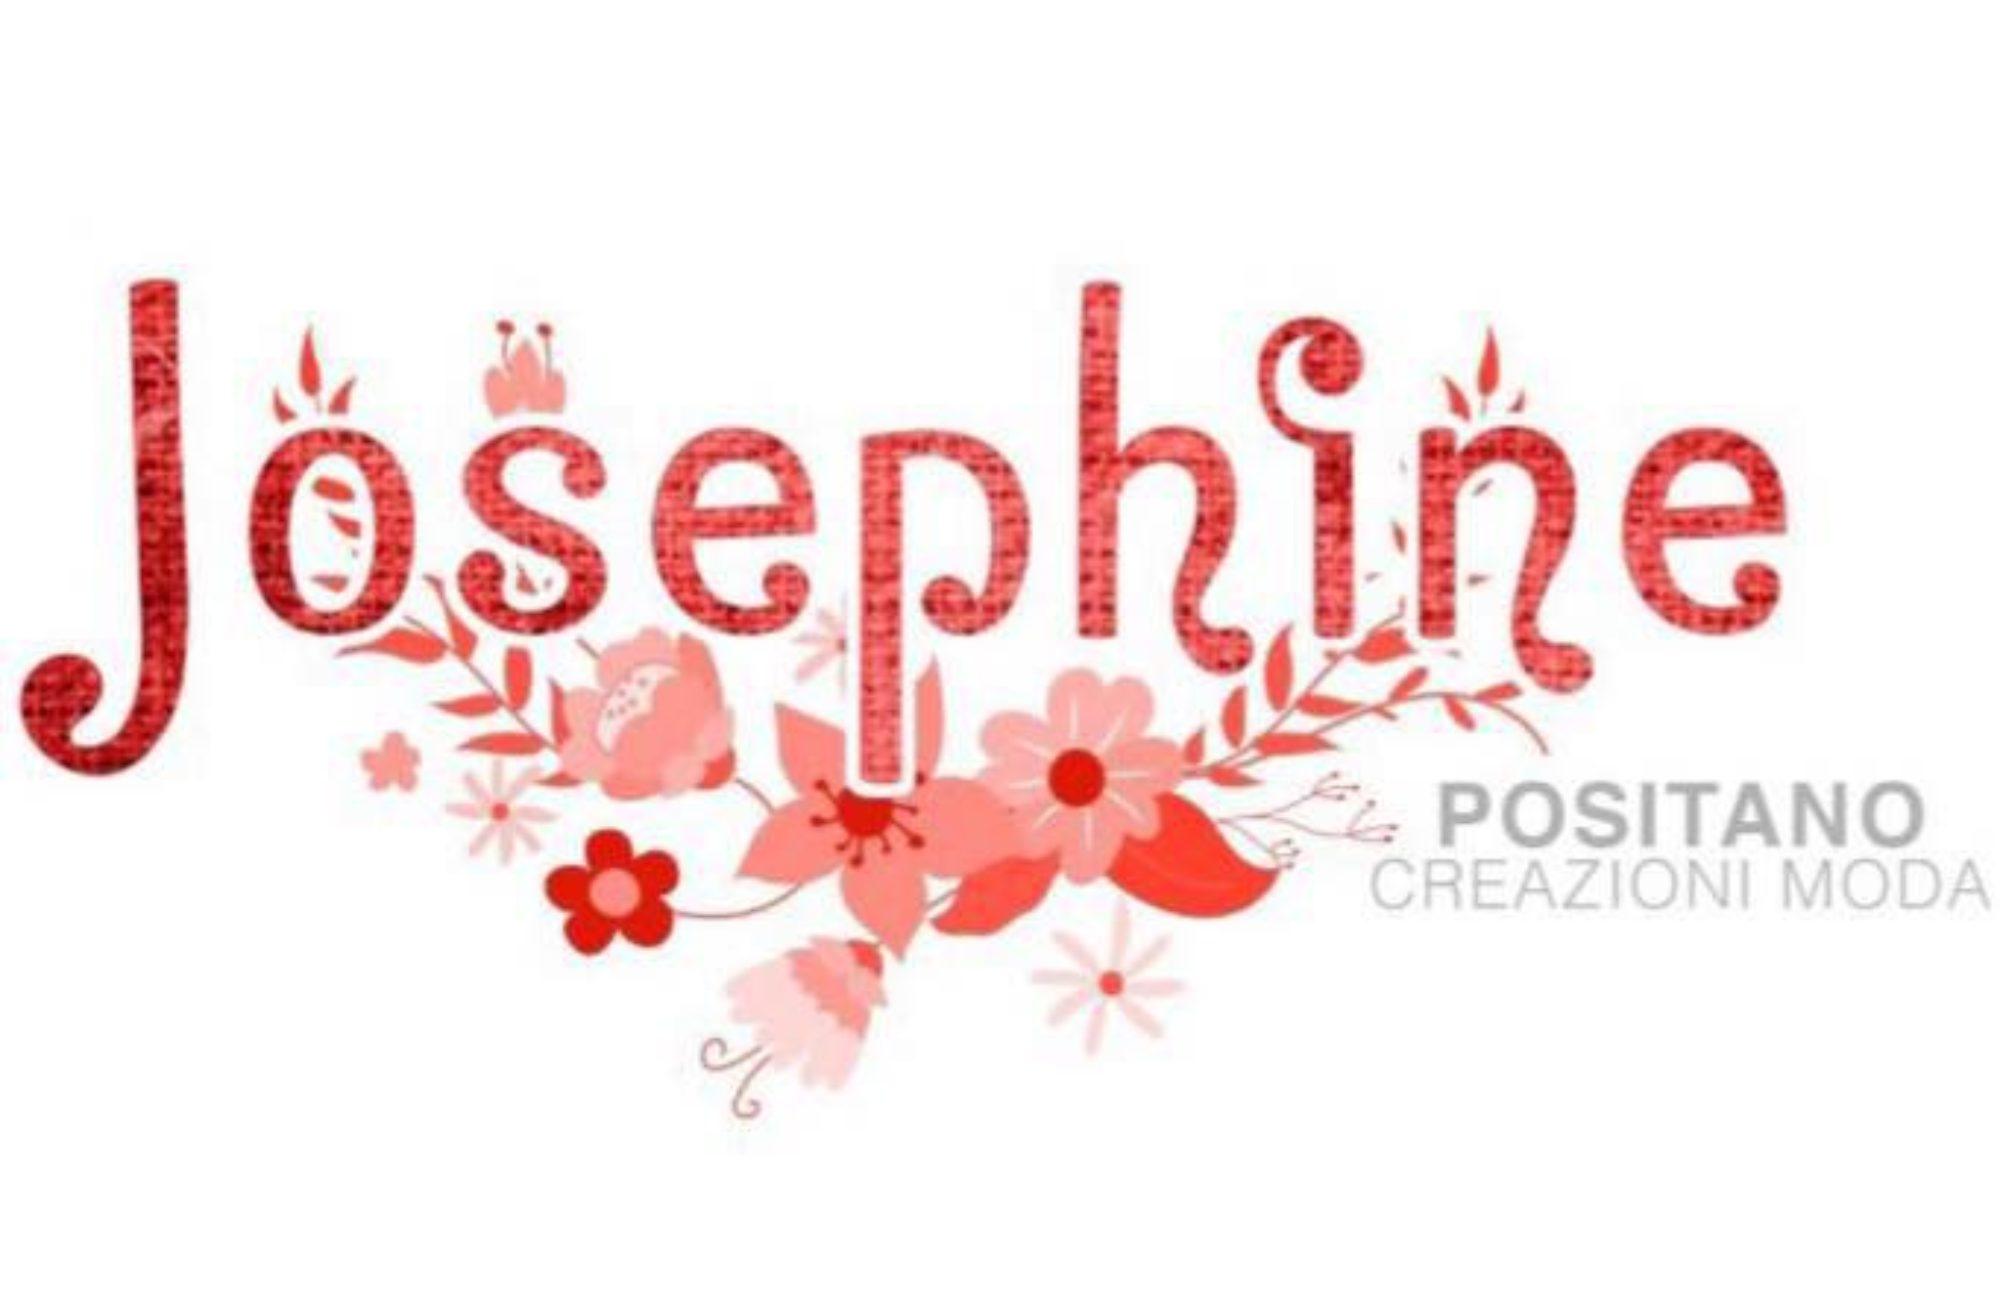 Josephine Creazioni